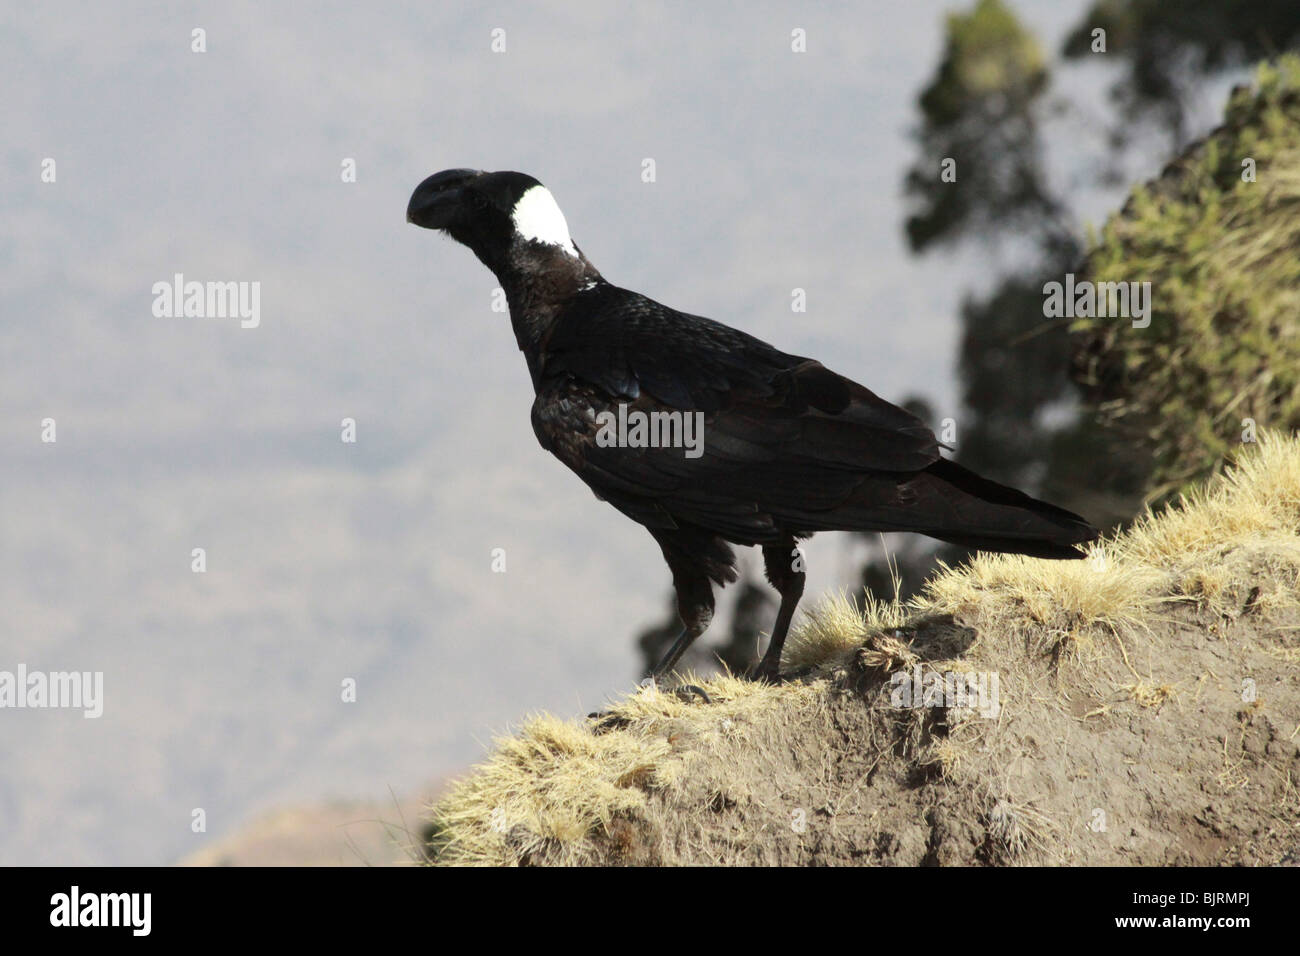 Africa, Ethiopia, Simien Mountains Thick-billed raven (Corvus crassirostris) - Stock Image